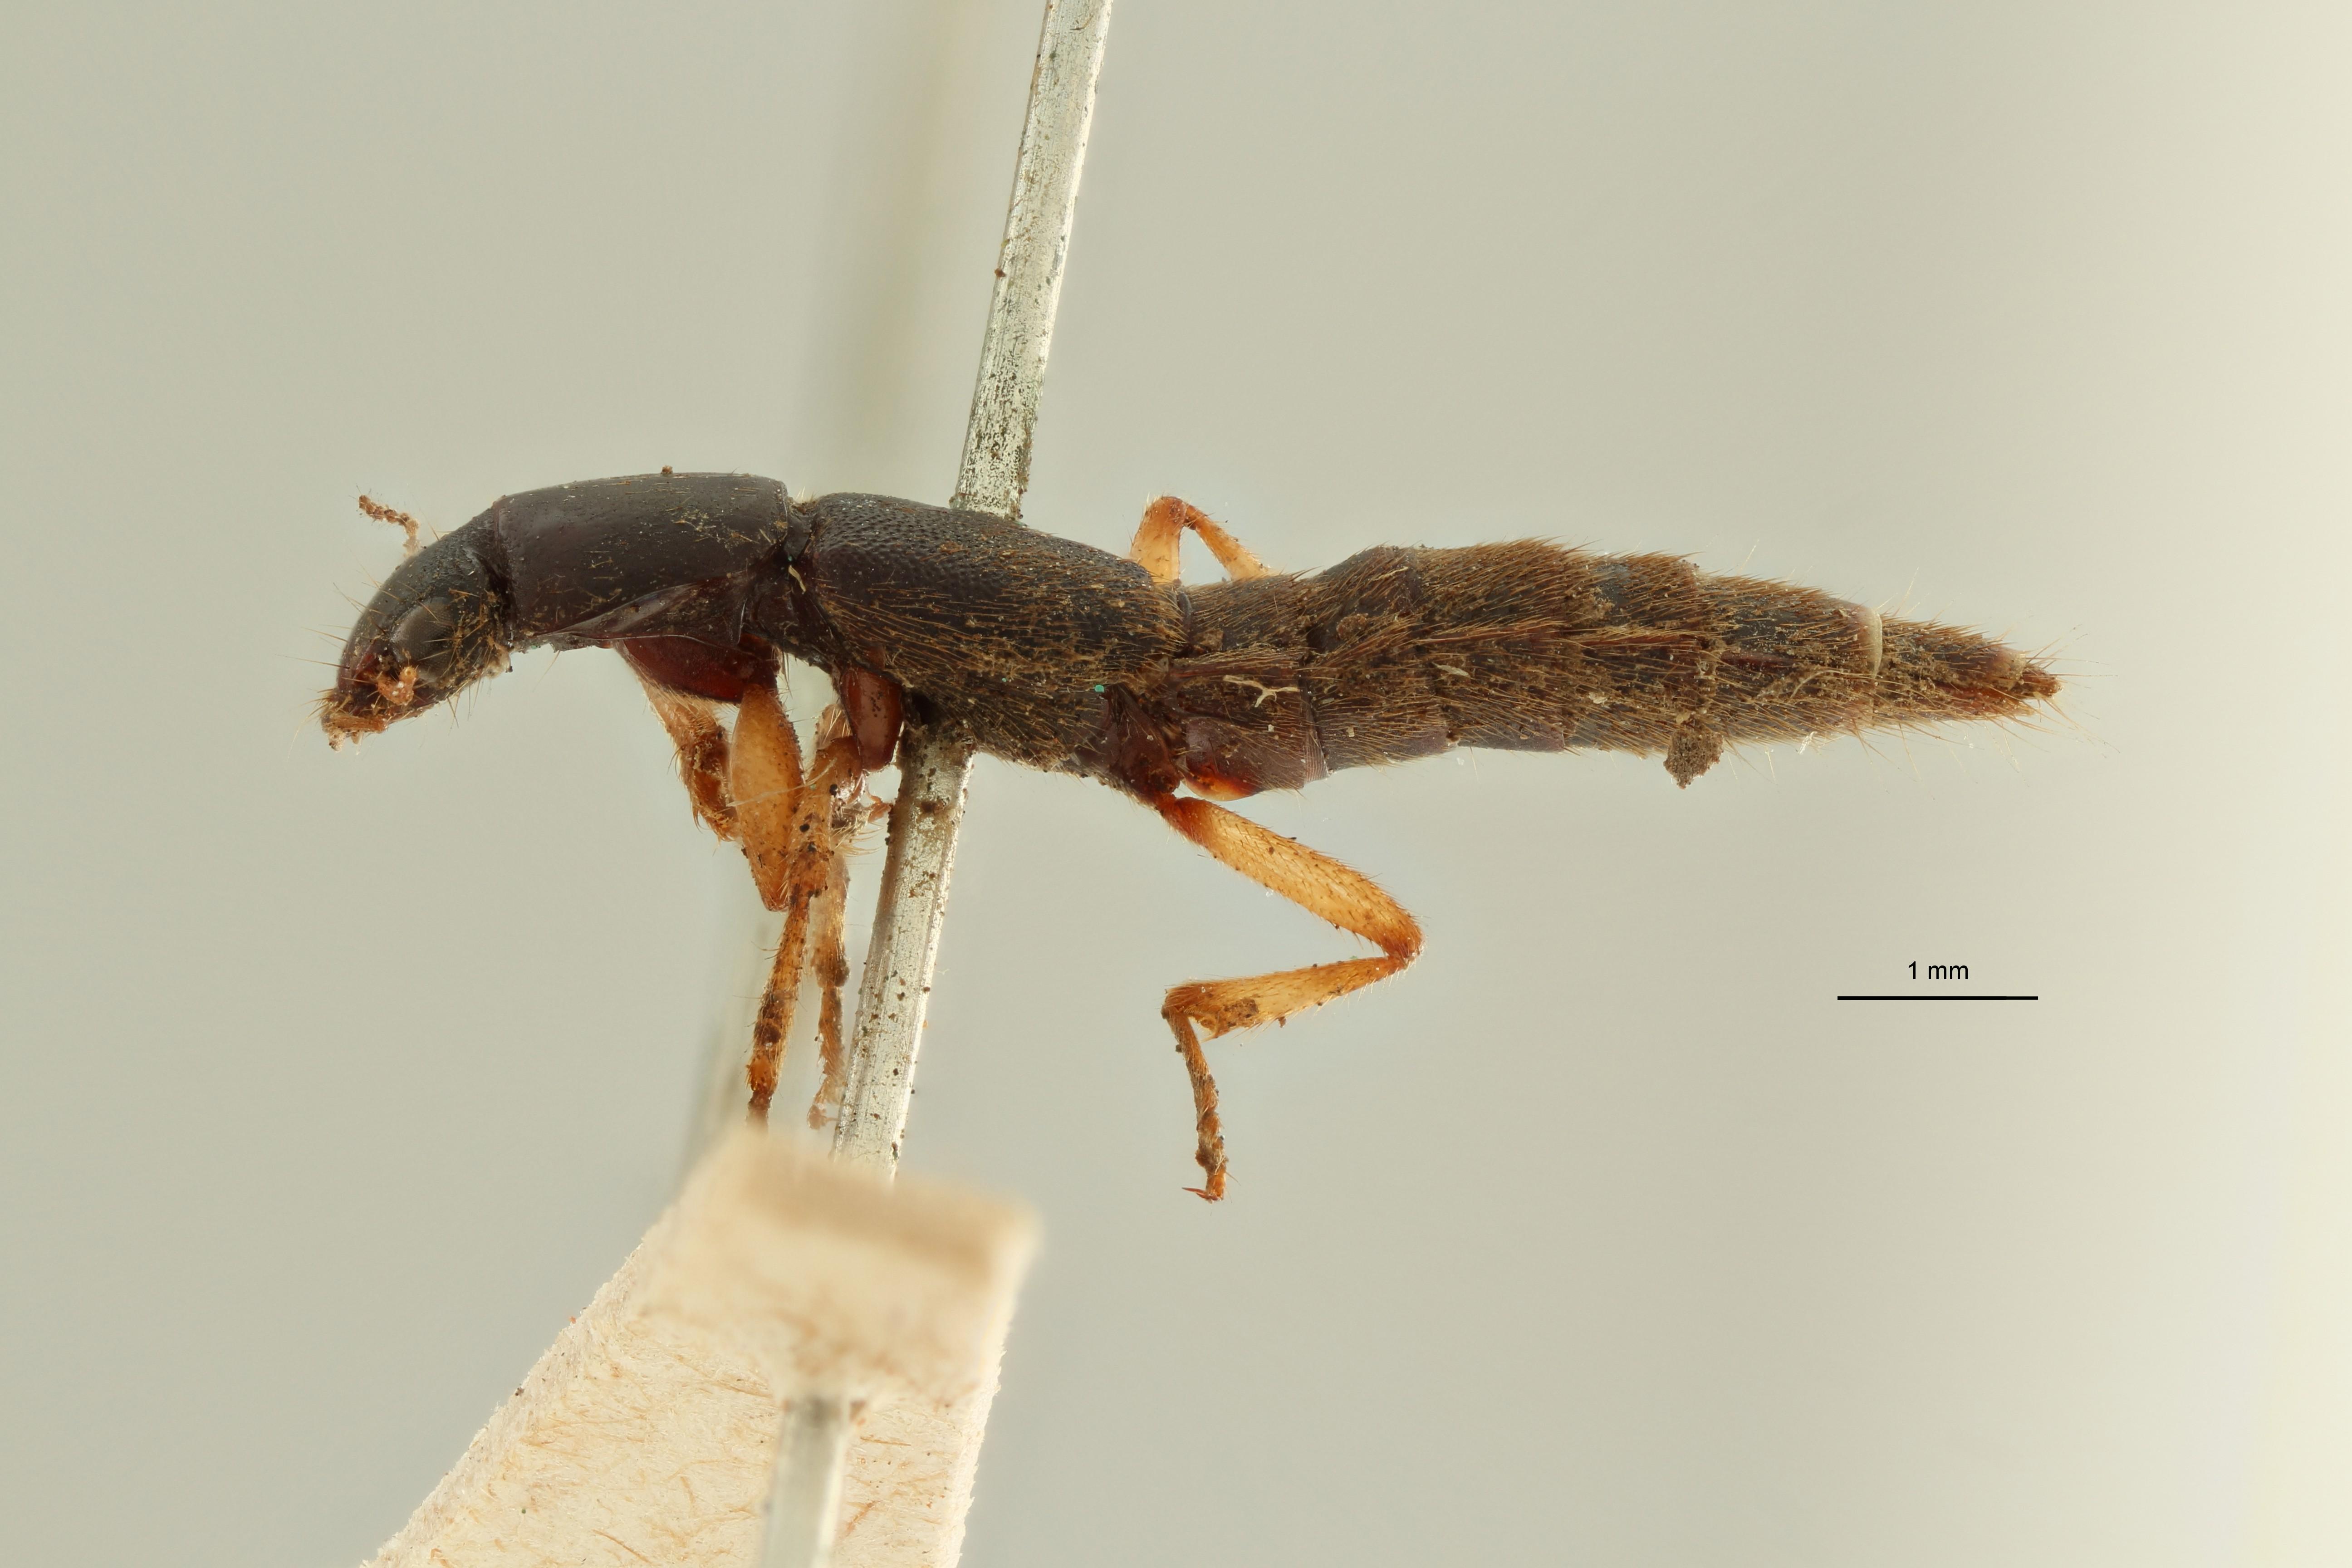 Pinophilus incultus et L ZS PMax Scaled.jpeg